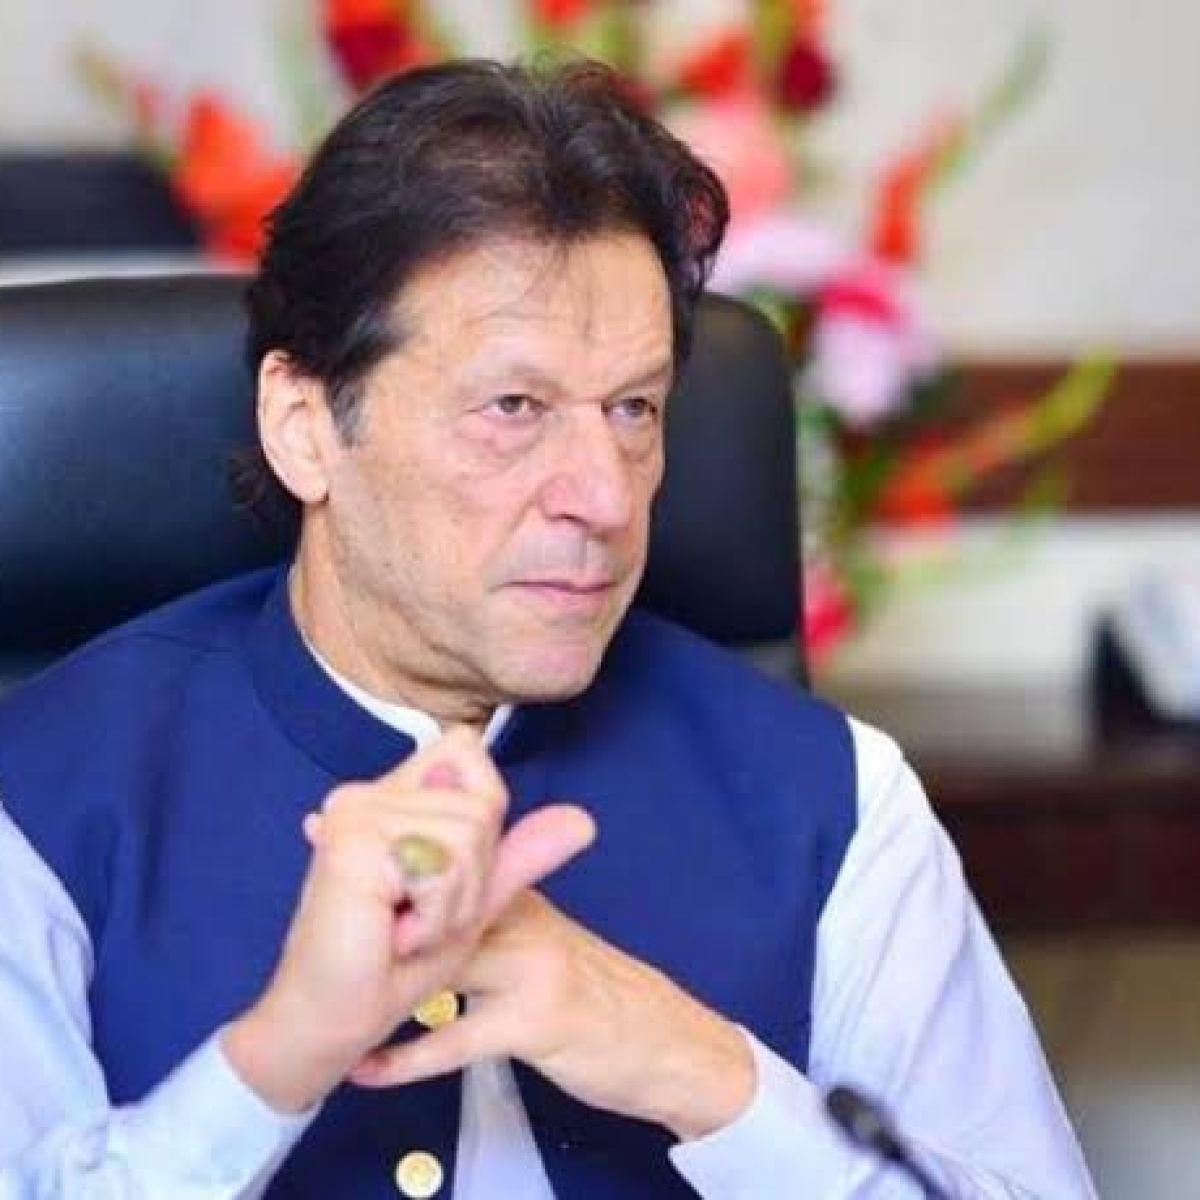 Big News Leak | Imran Khan Is CoronaVirus Positive Claims British News